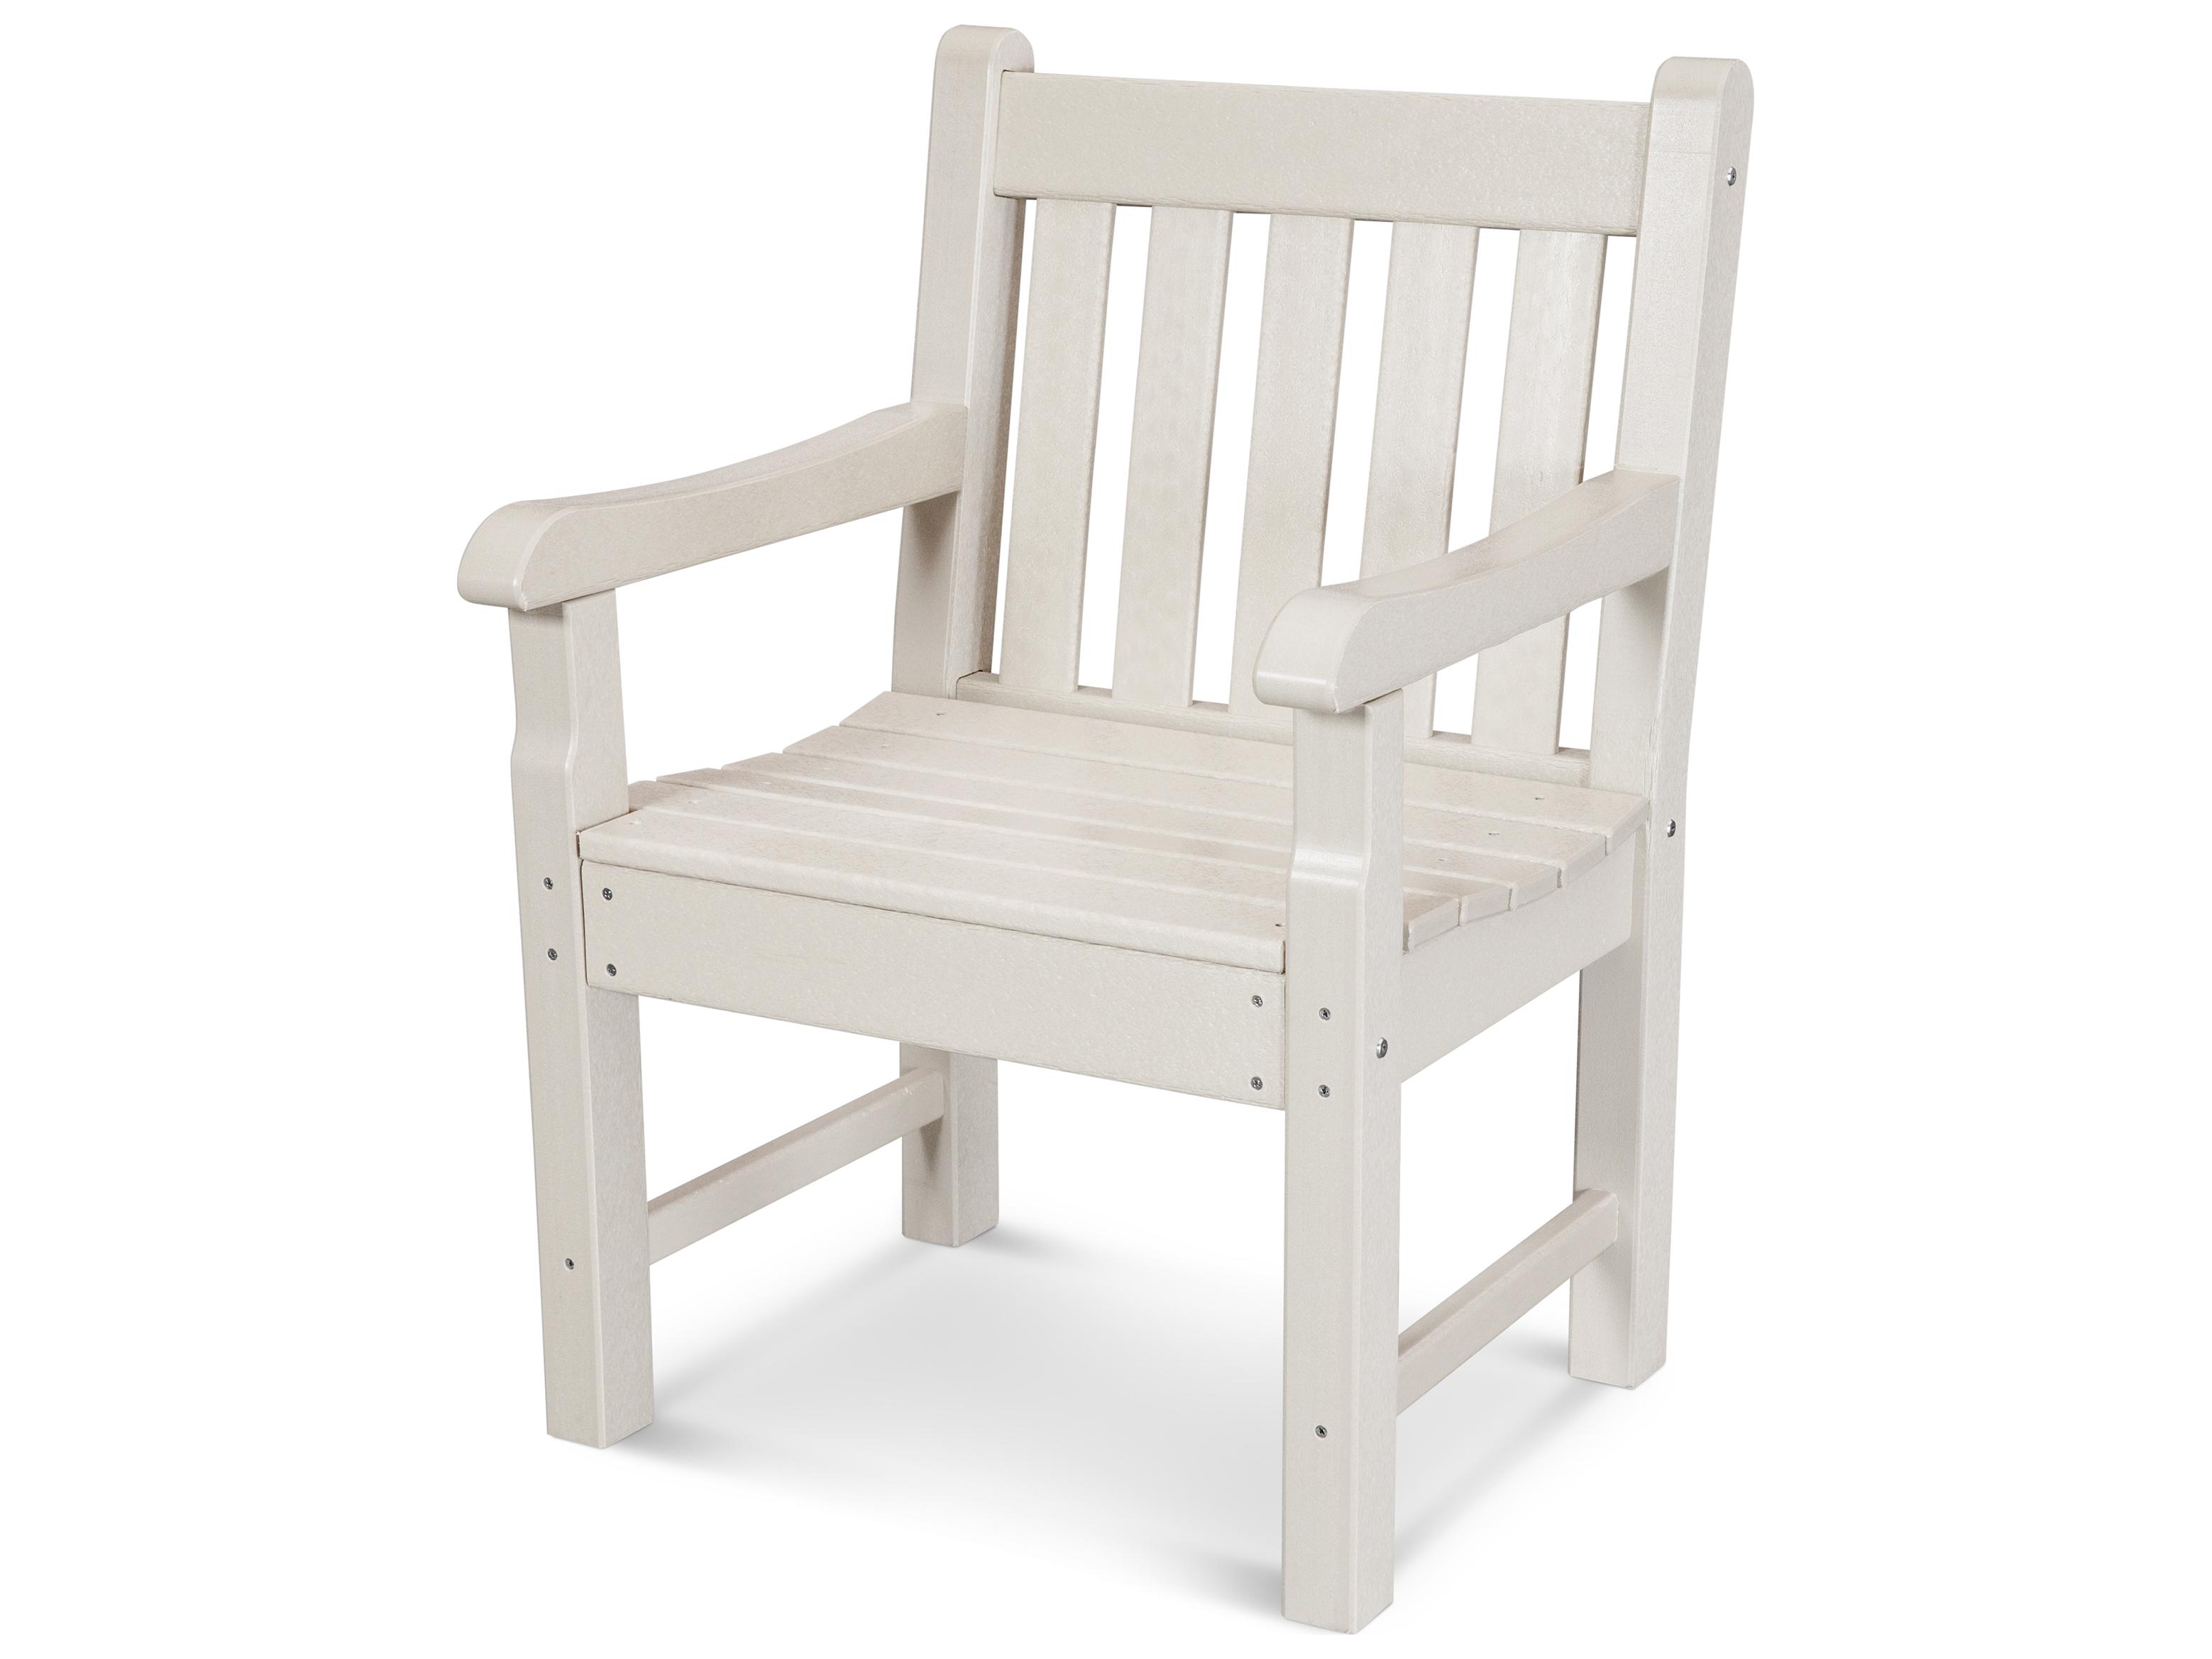 Polywood 174 Rockford Recycled Plastic Arm Chair Rkb24